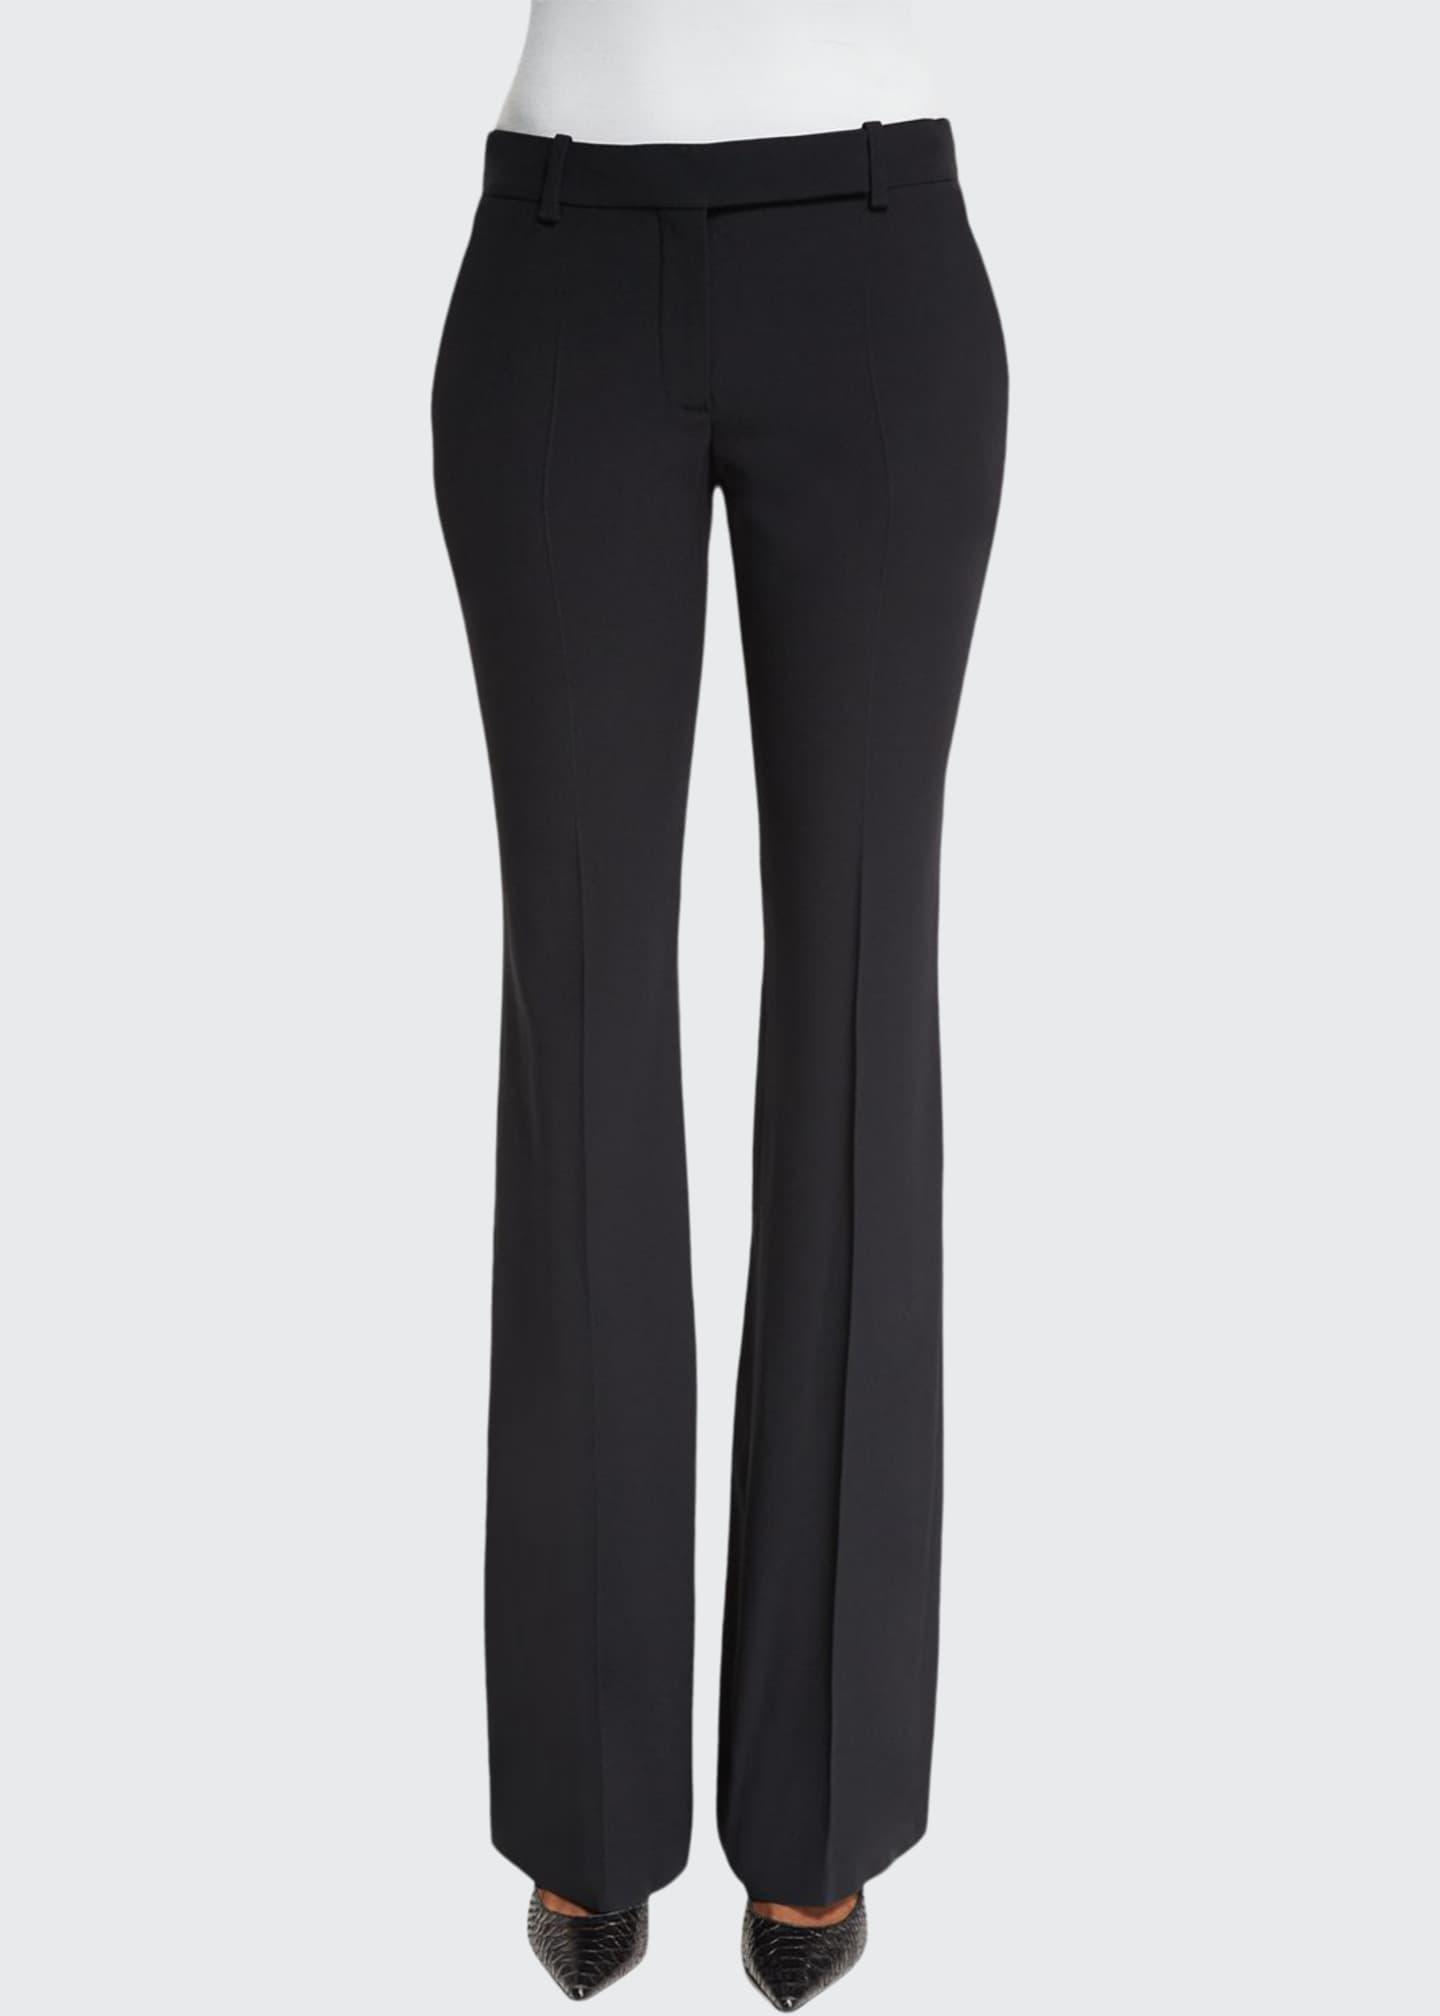 Alexander McQueen Classic Cropped Pants, Black